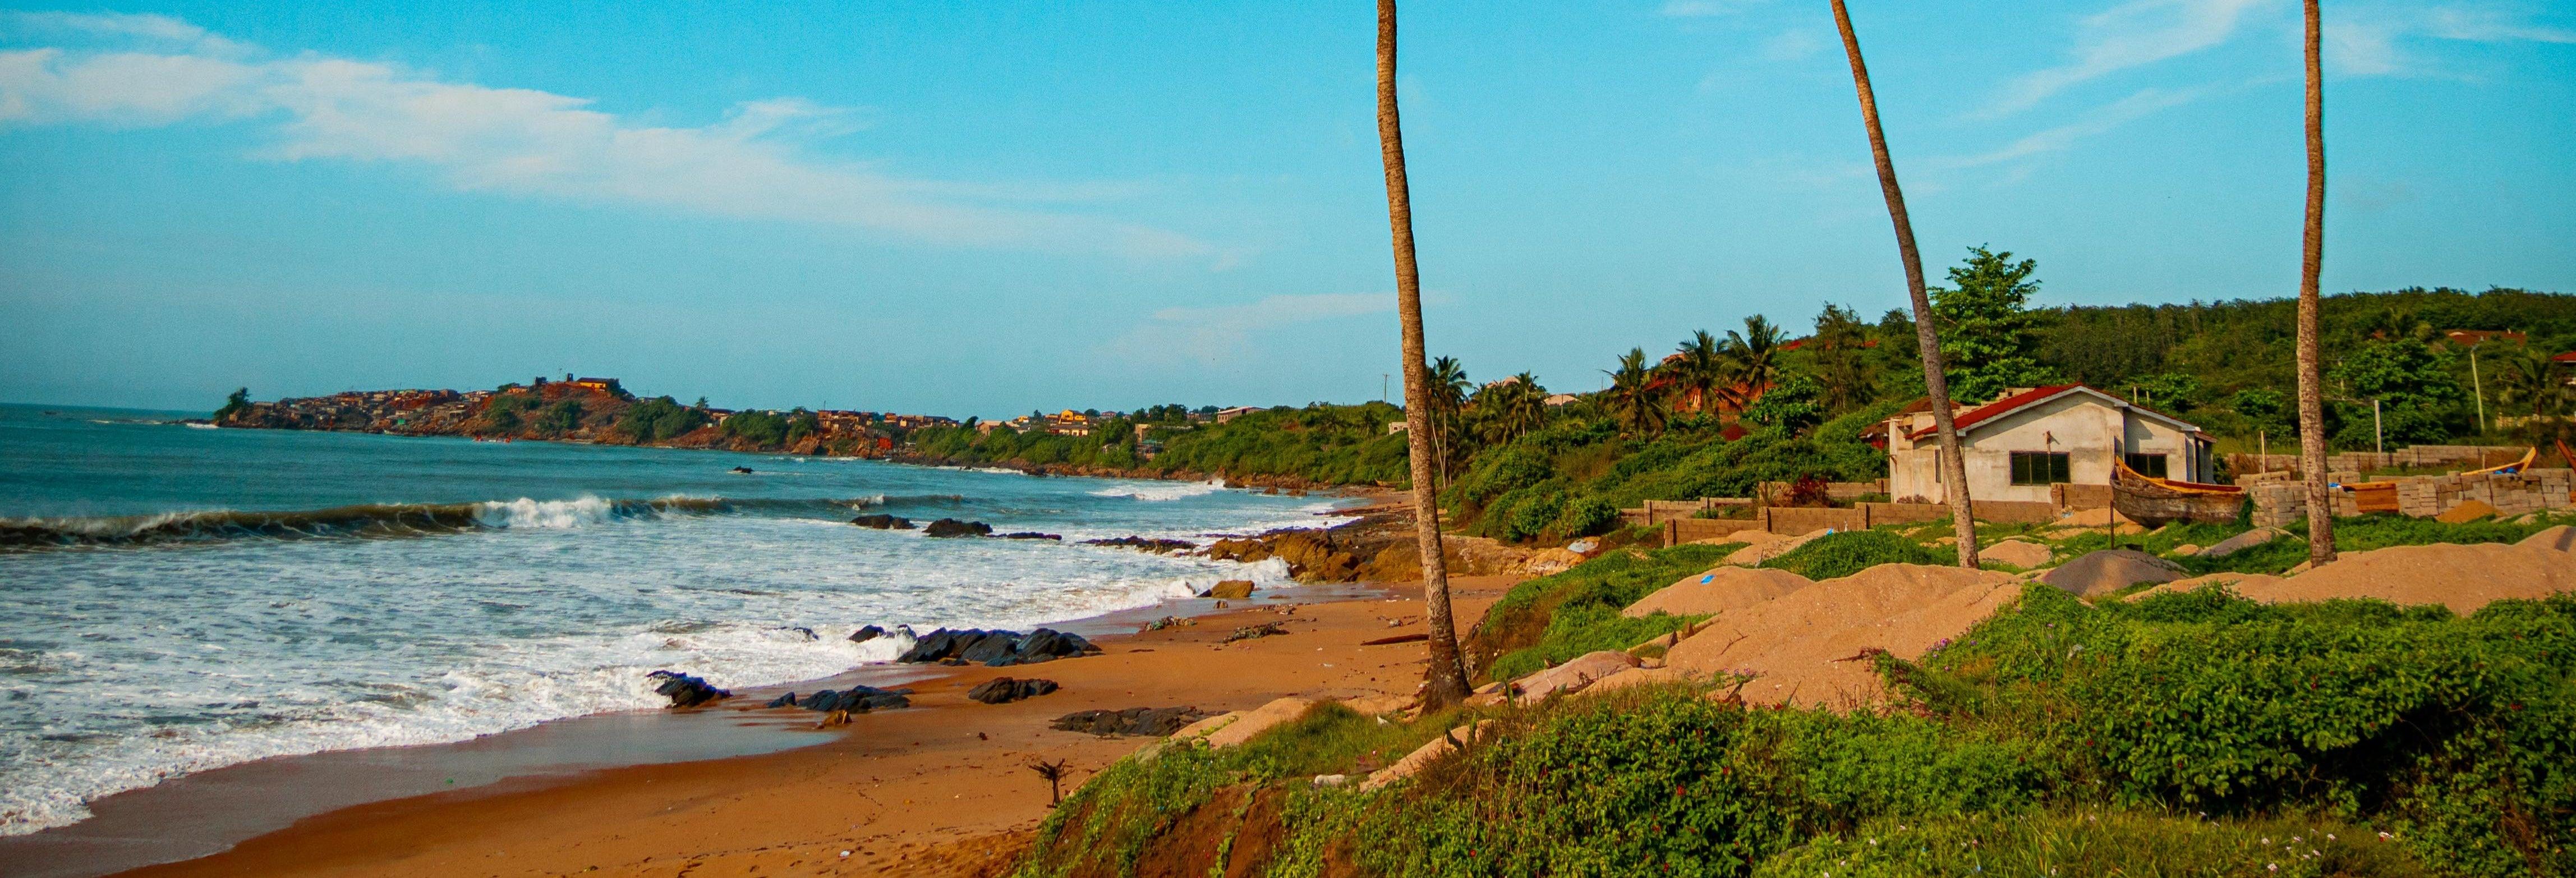 Ghana 2 Day Tour